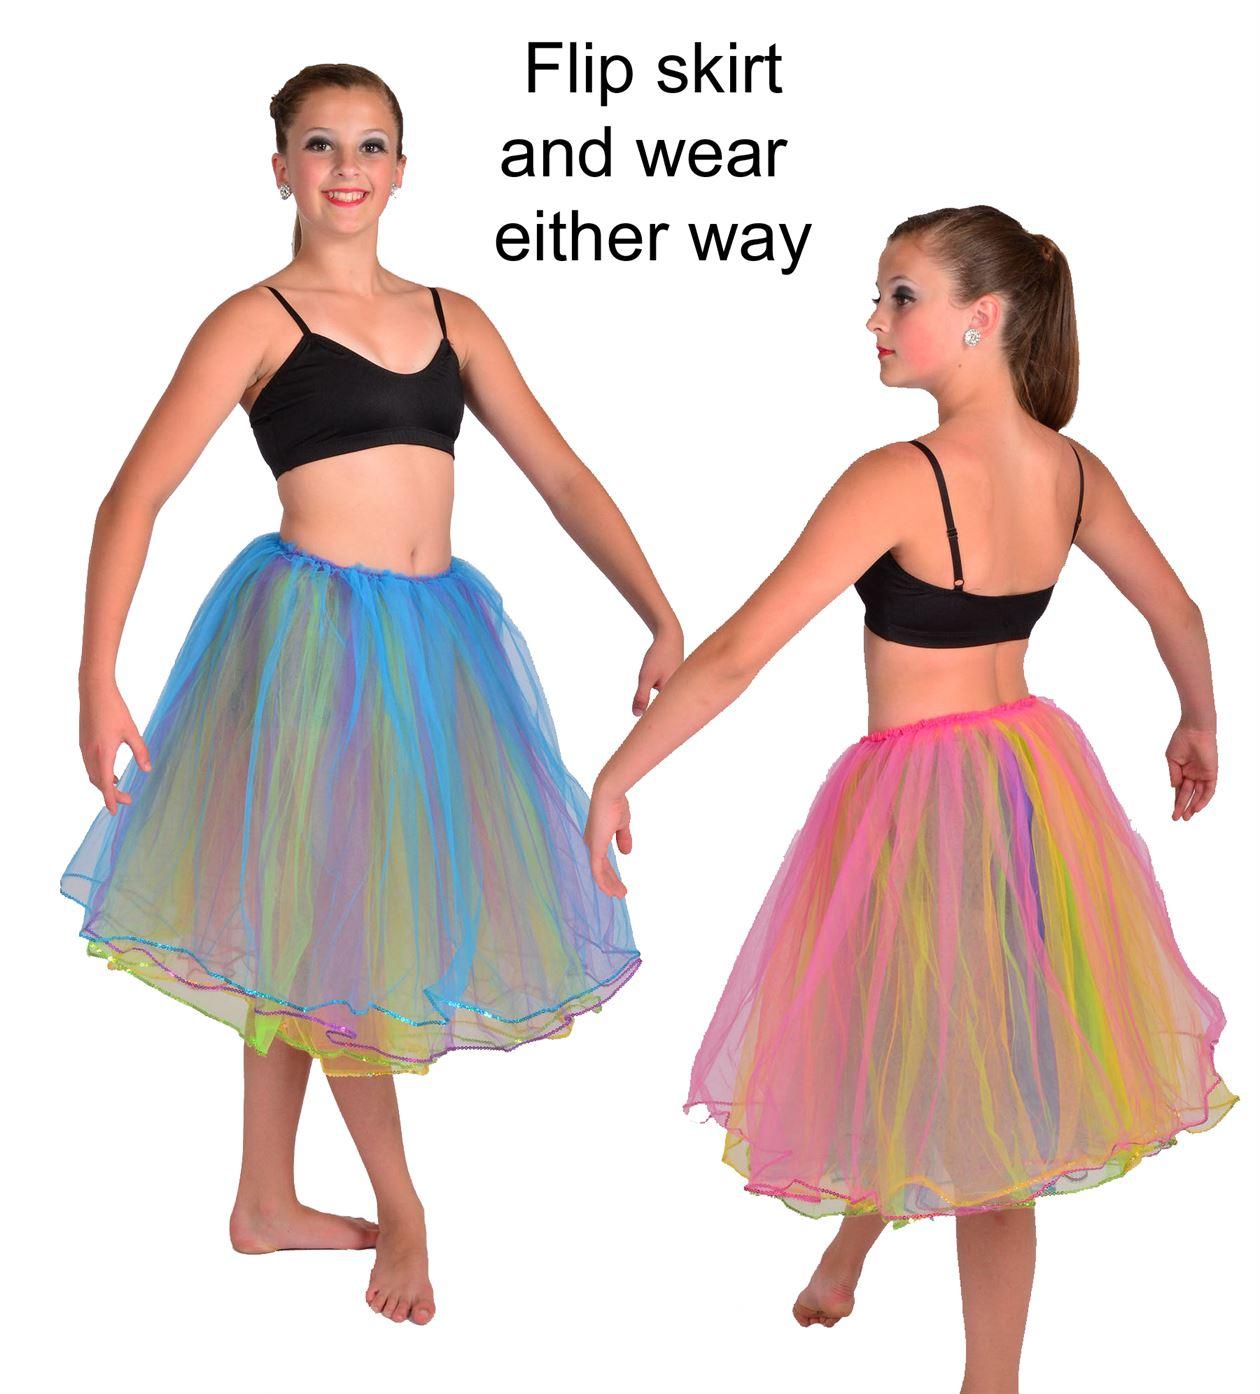 6001 sequin layered tutu|Pumpers Dancewear